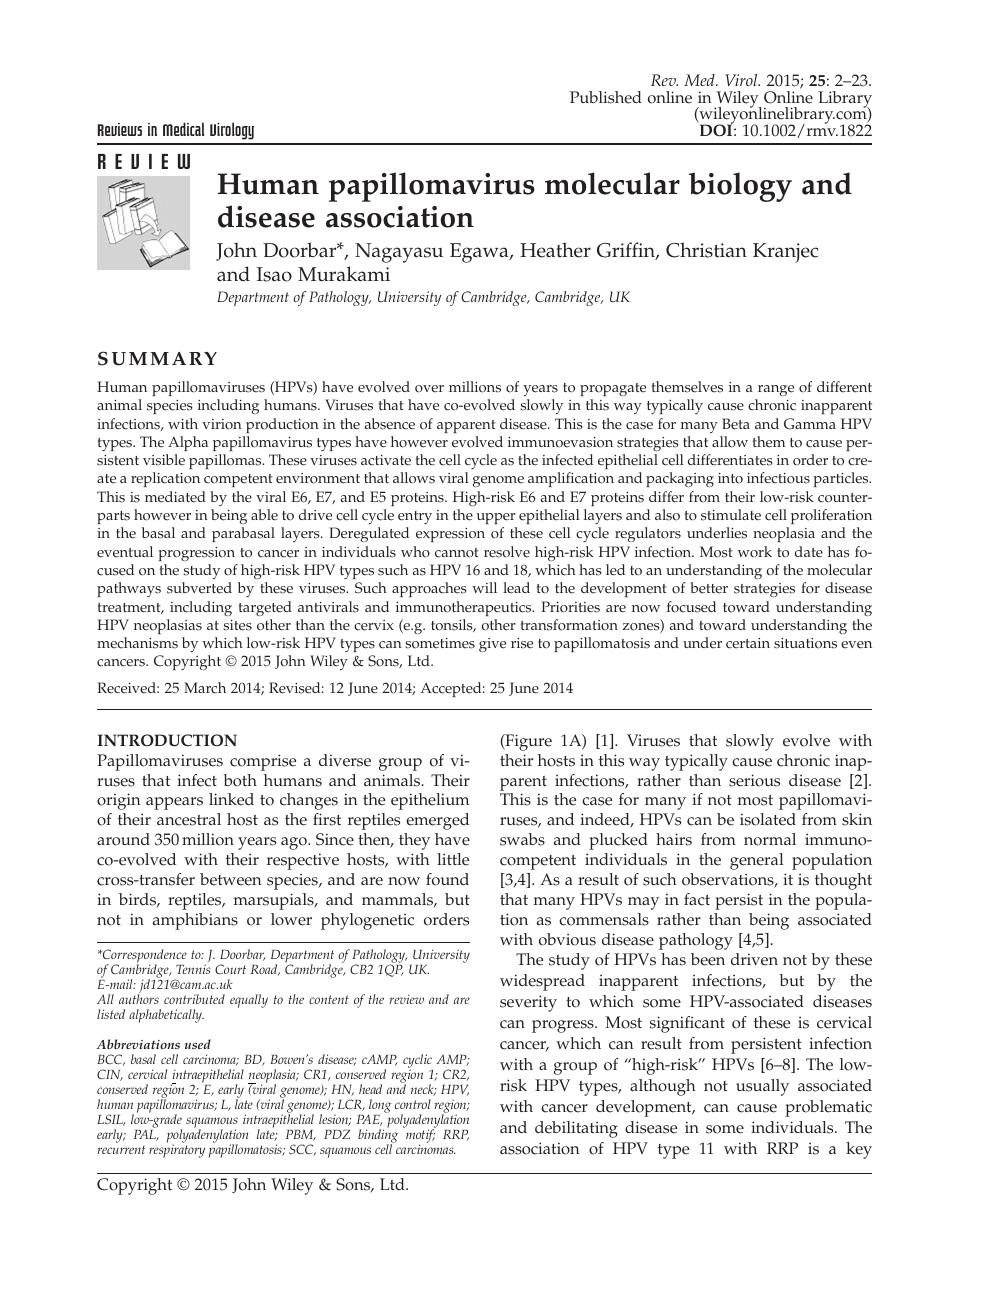 Humán papillomavírus hpv uk -